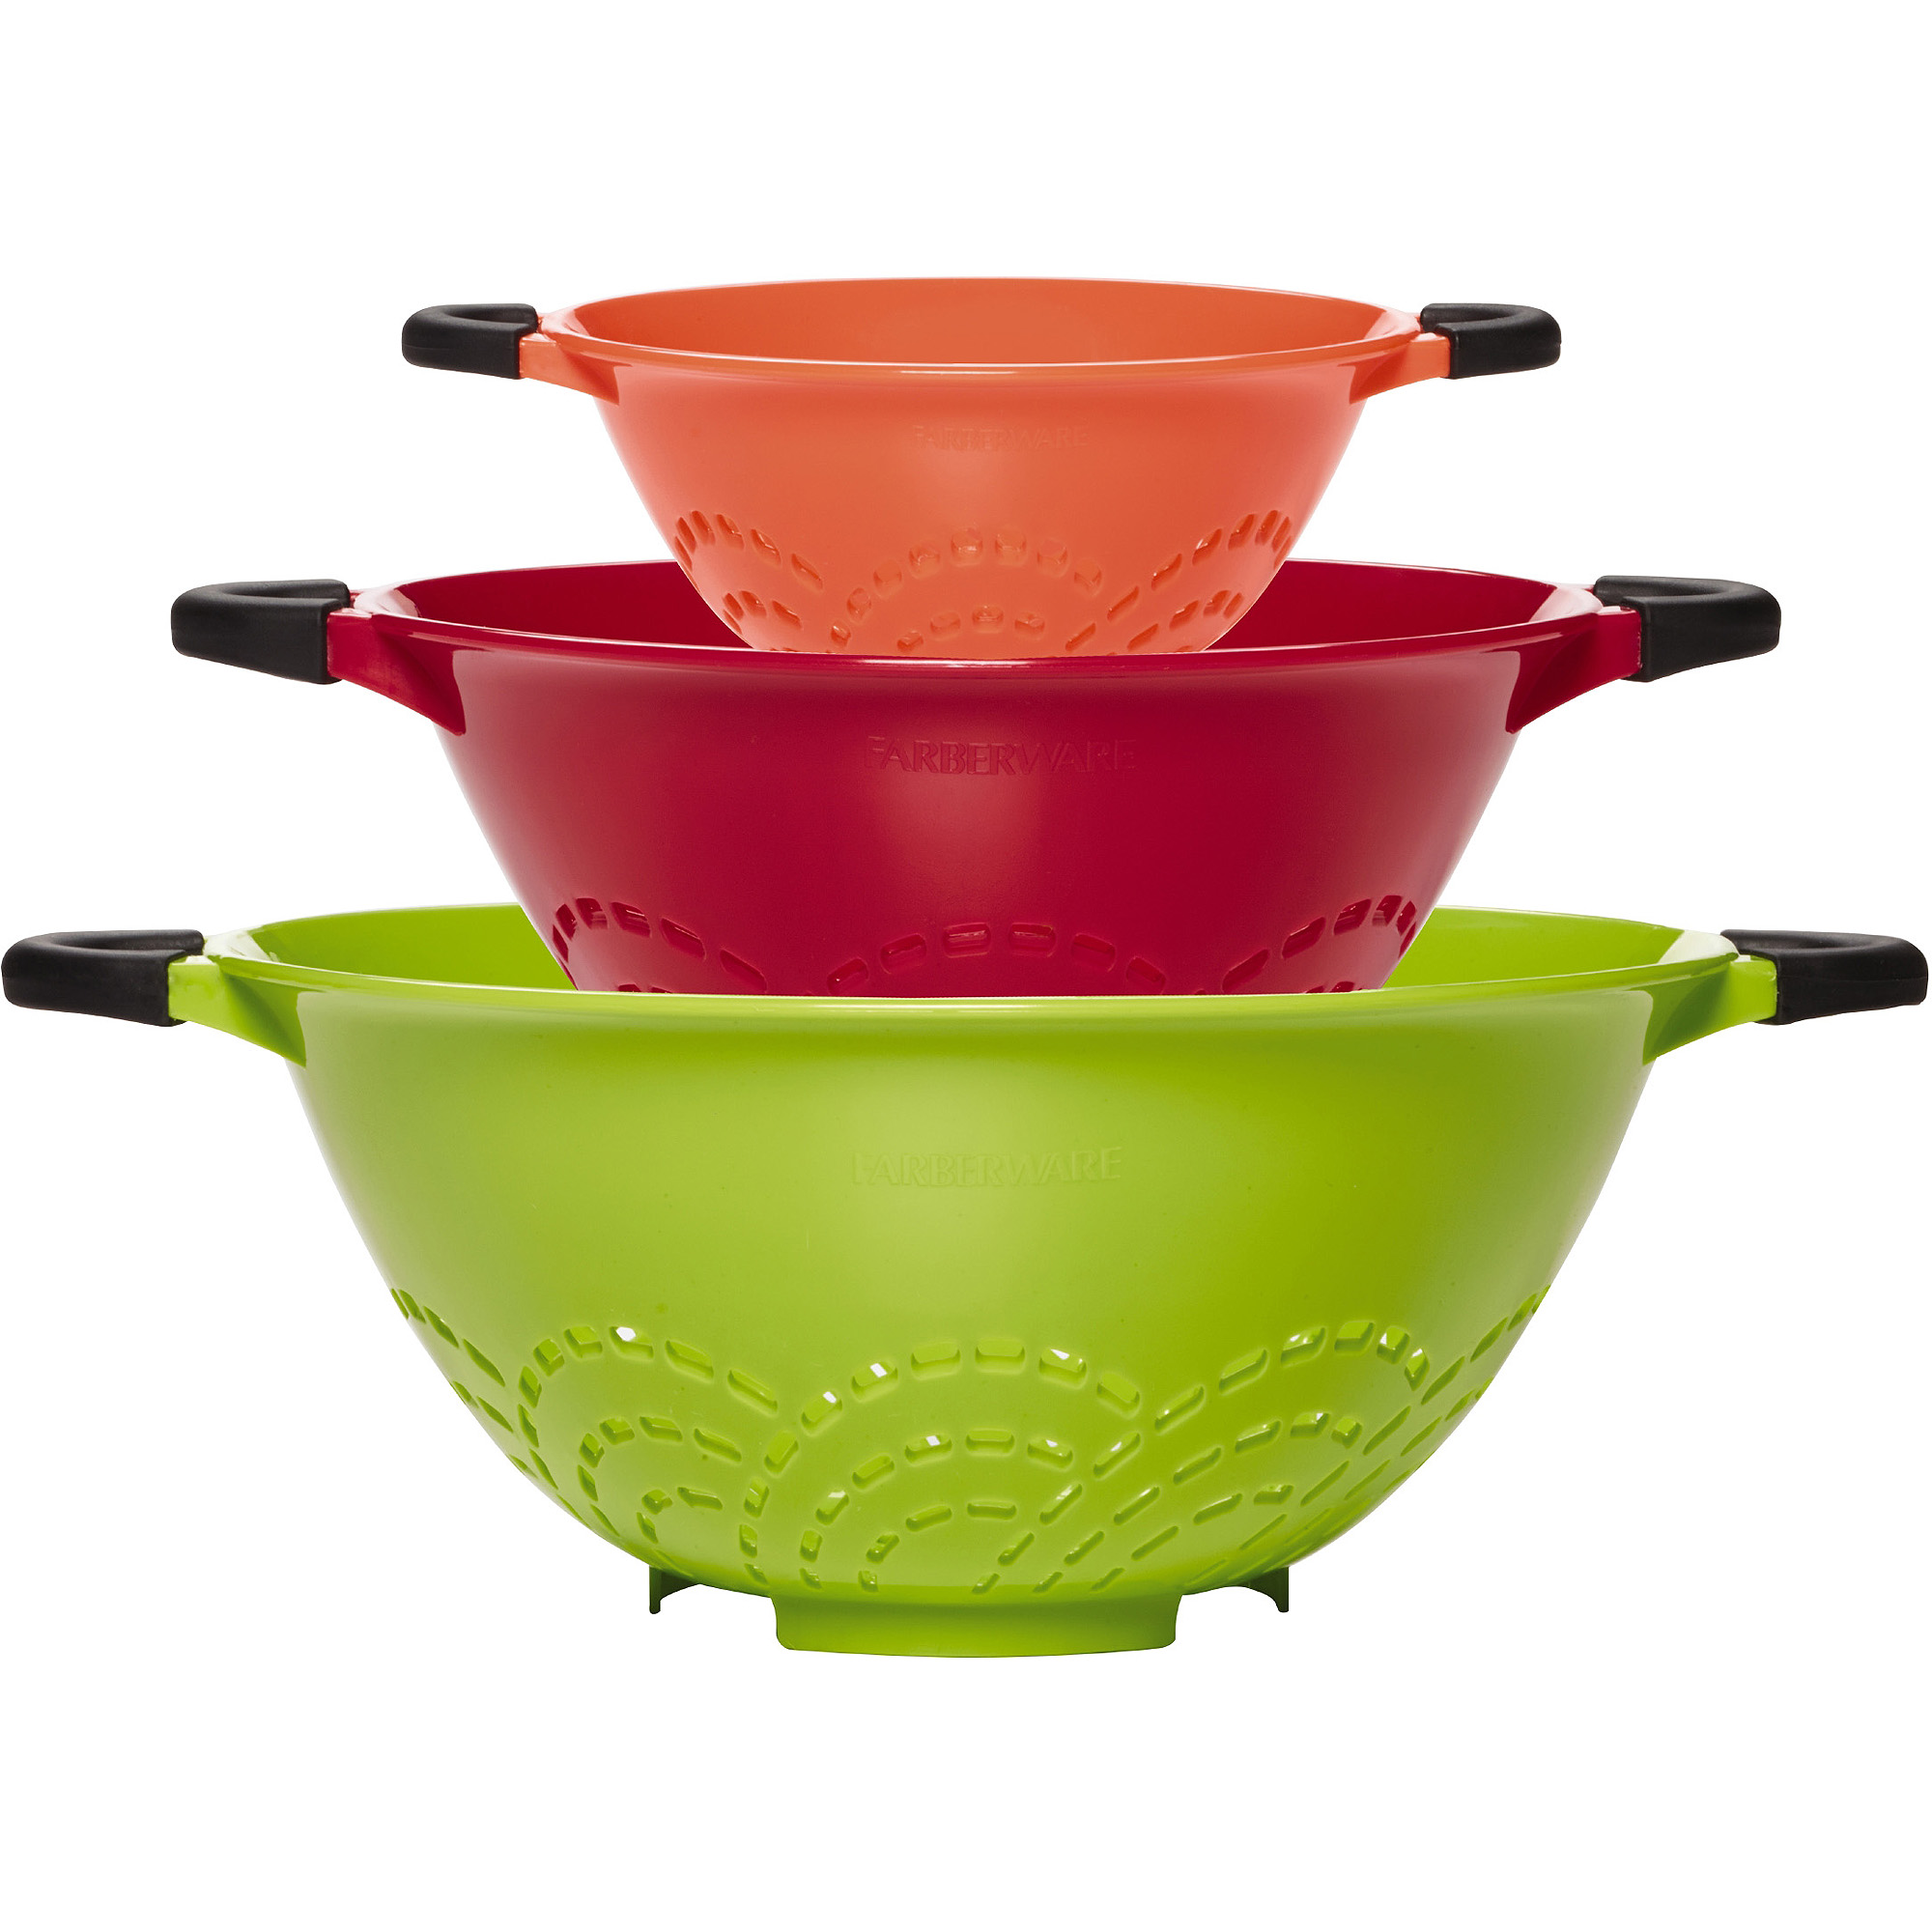 Farberware Soft Grip Set of 3 Colanders, Assorted Colors